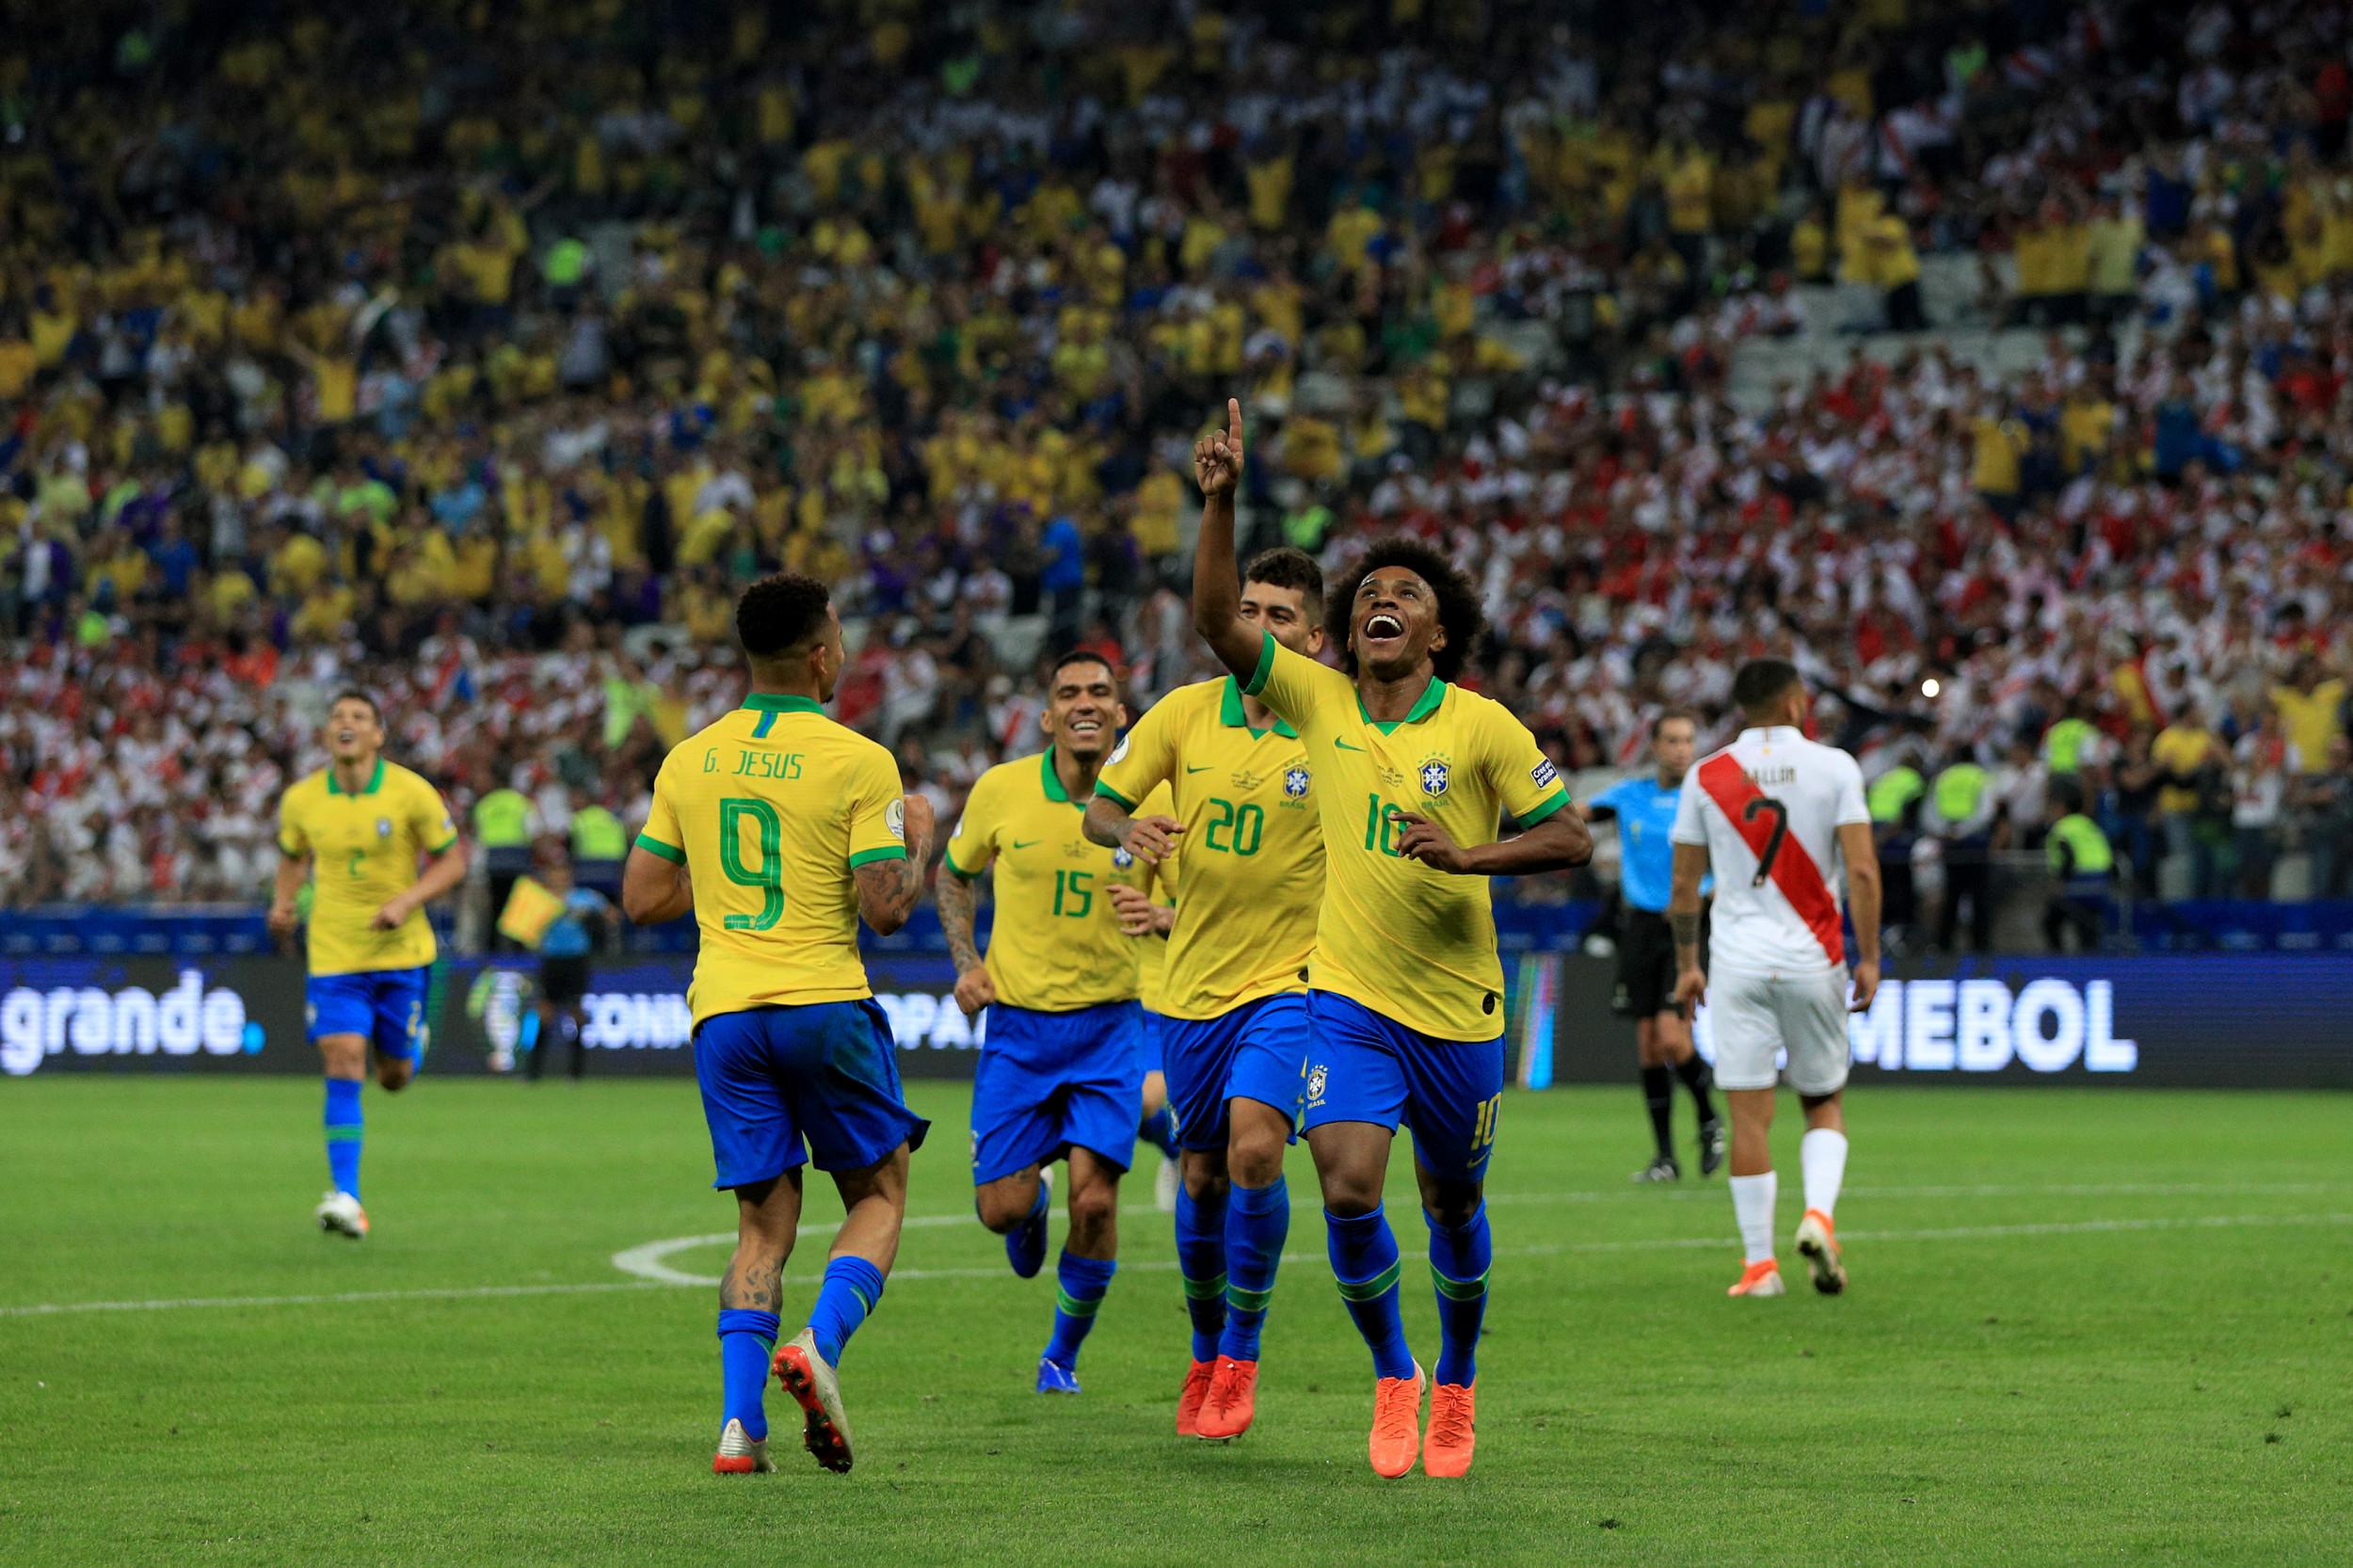 Copa America 2019: Where to Watch Quarter-Finals, Live